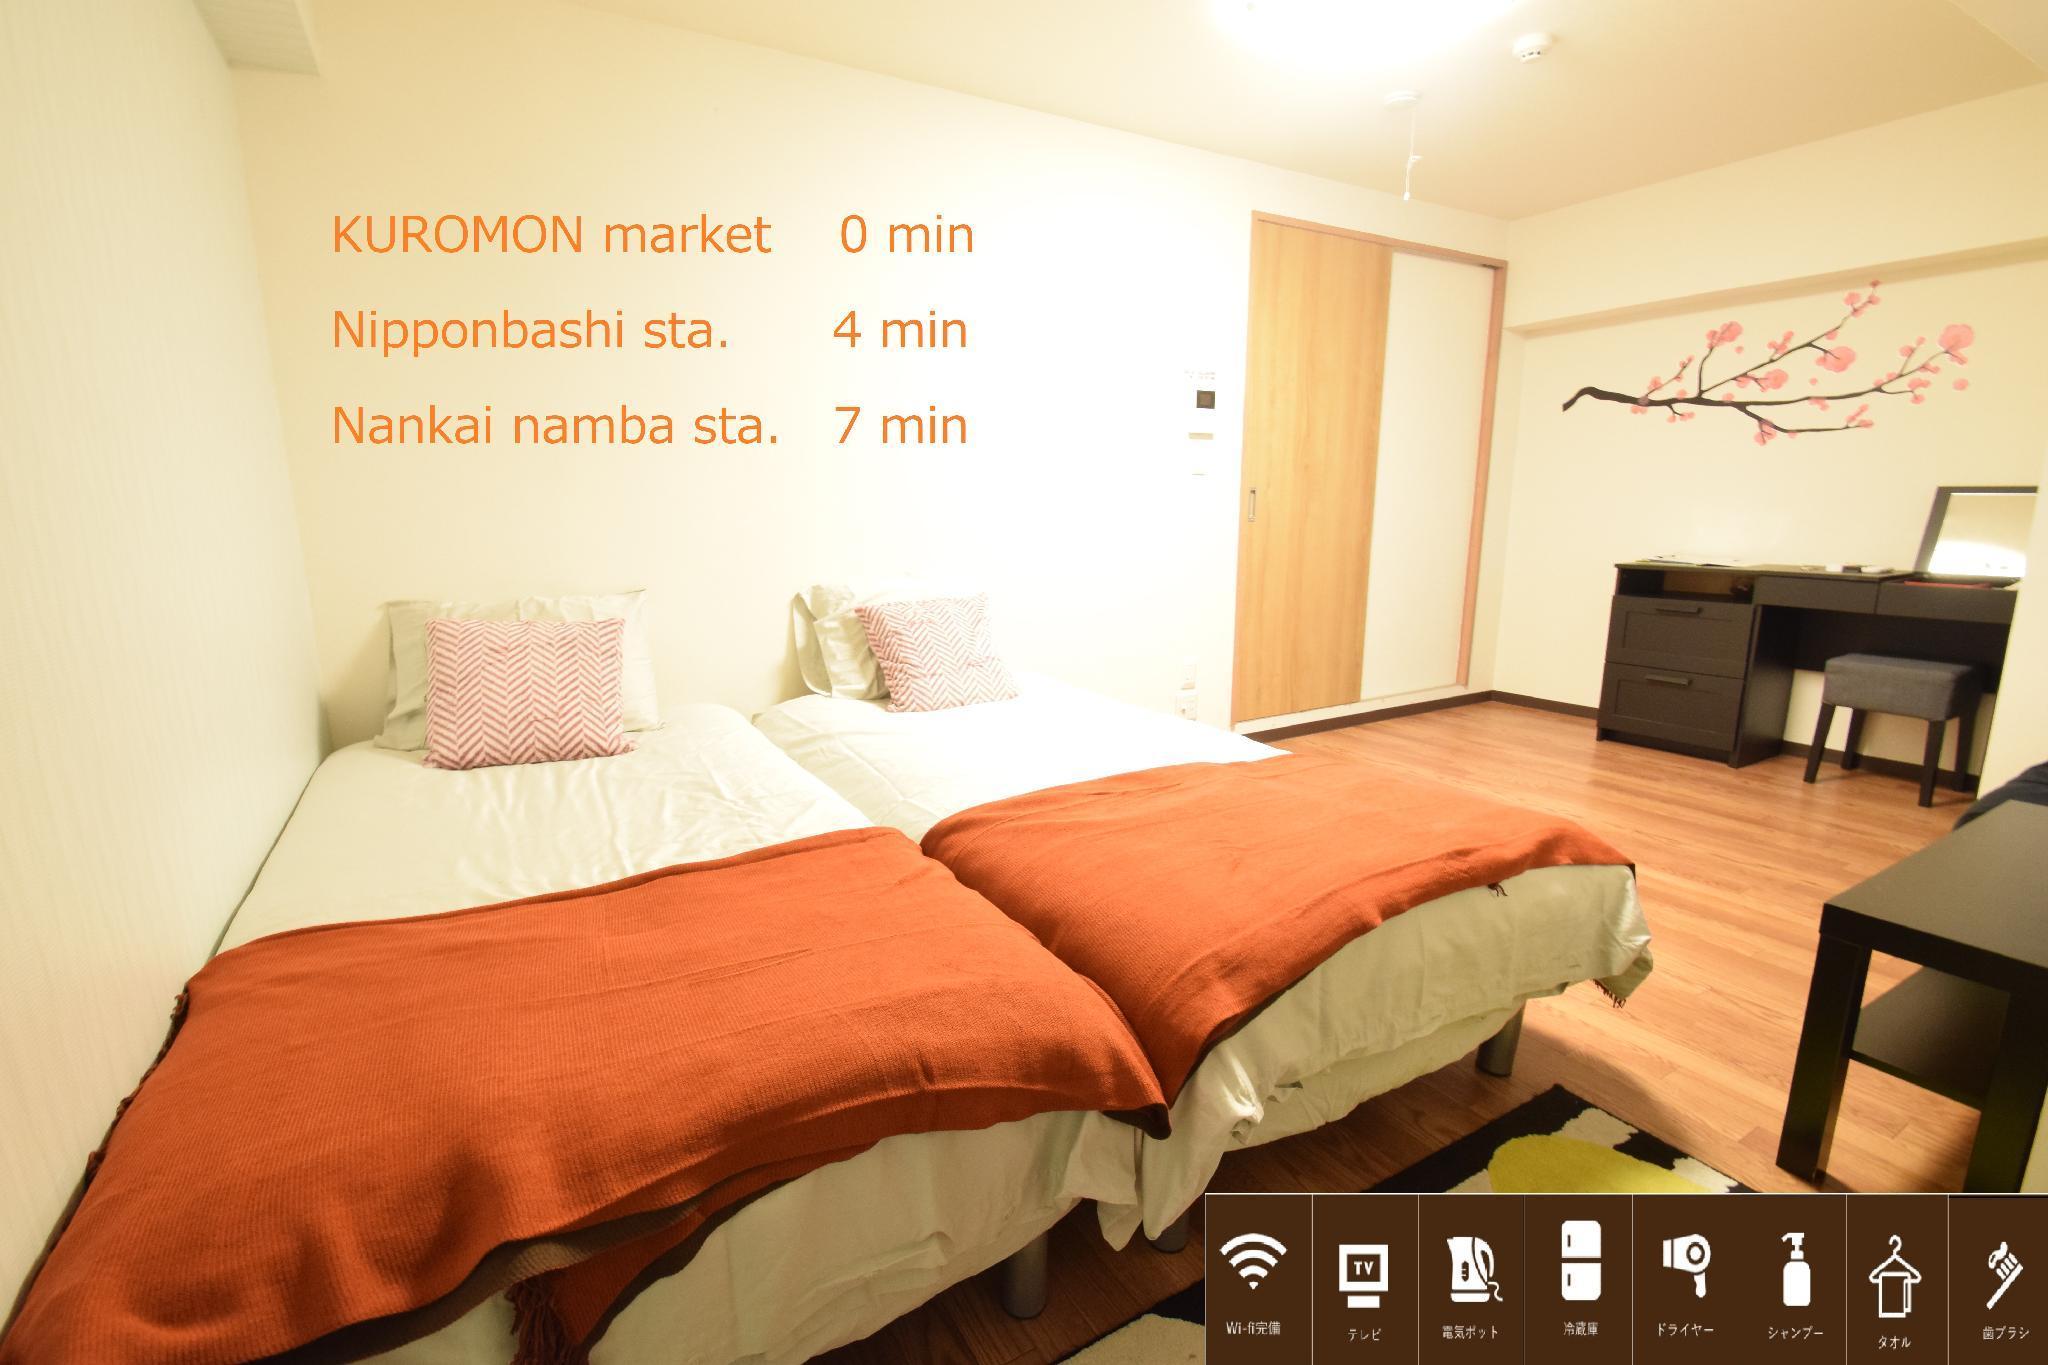 SandW 1 Bedroom Apt Near Kuromon Market 203